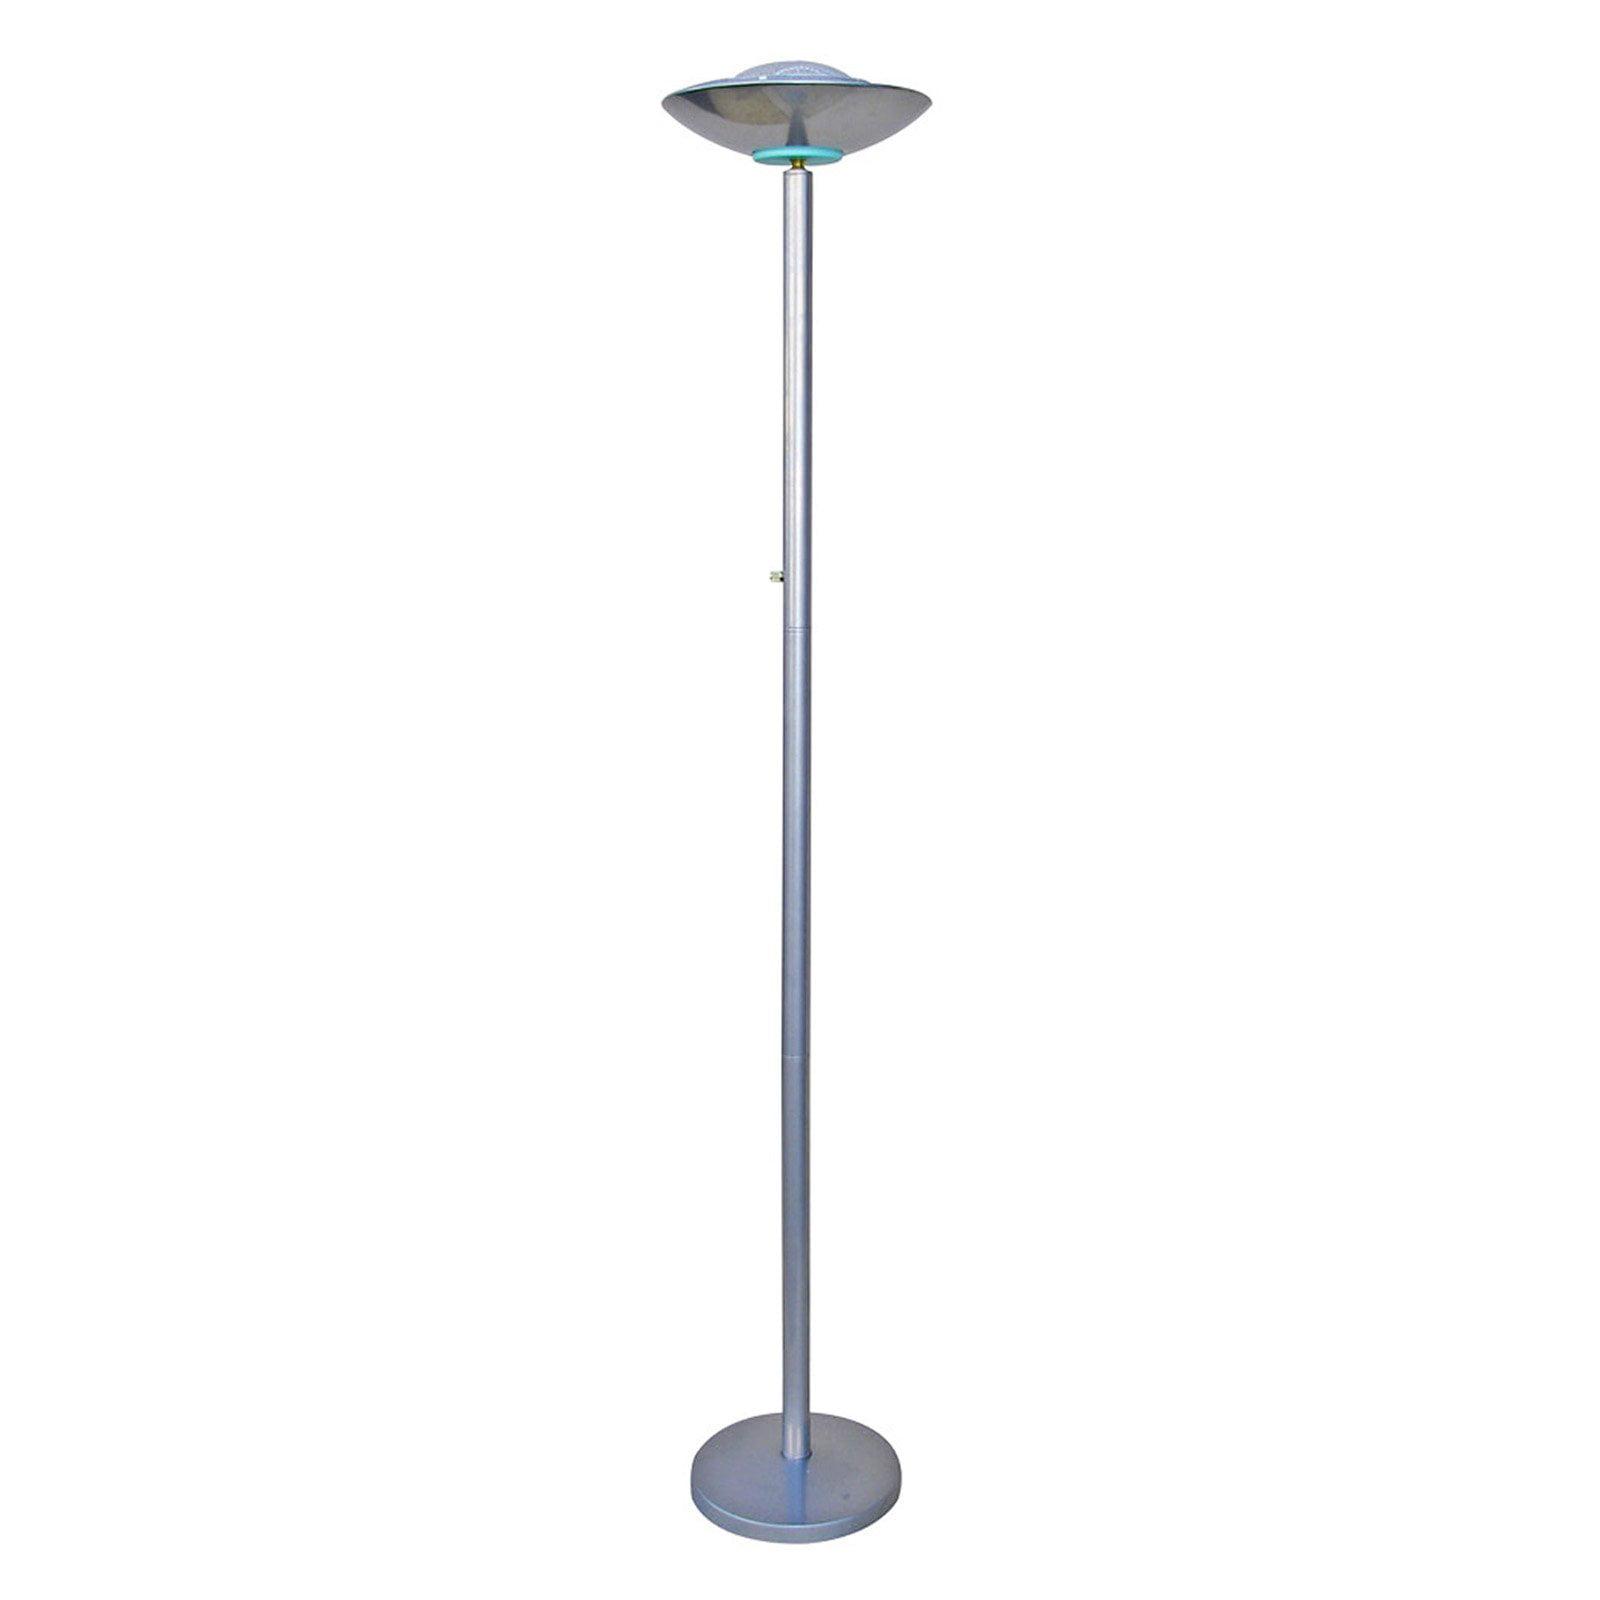 Floor Lamp Modern Halogen Torchiere Tall Silver Light